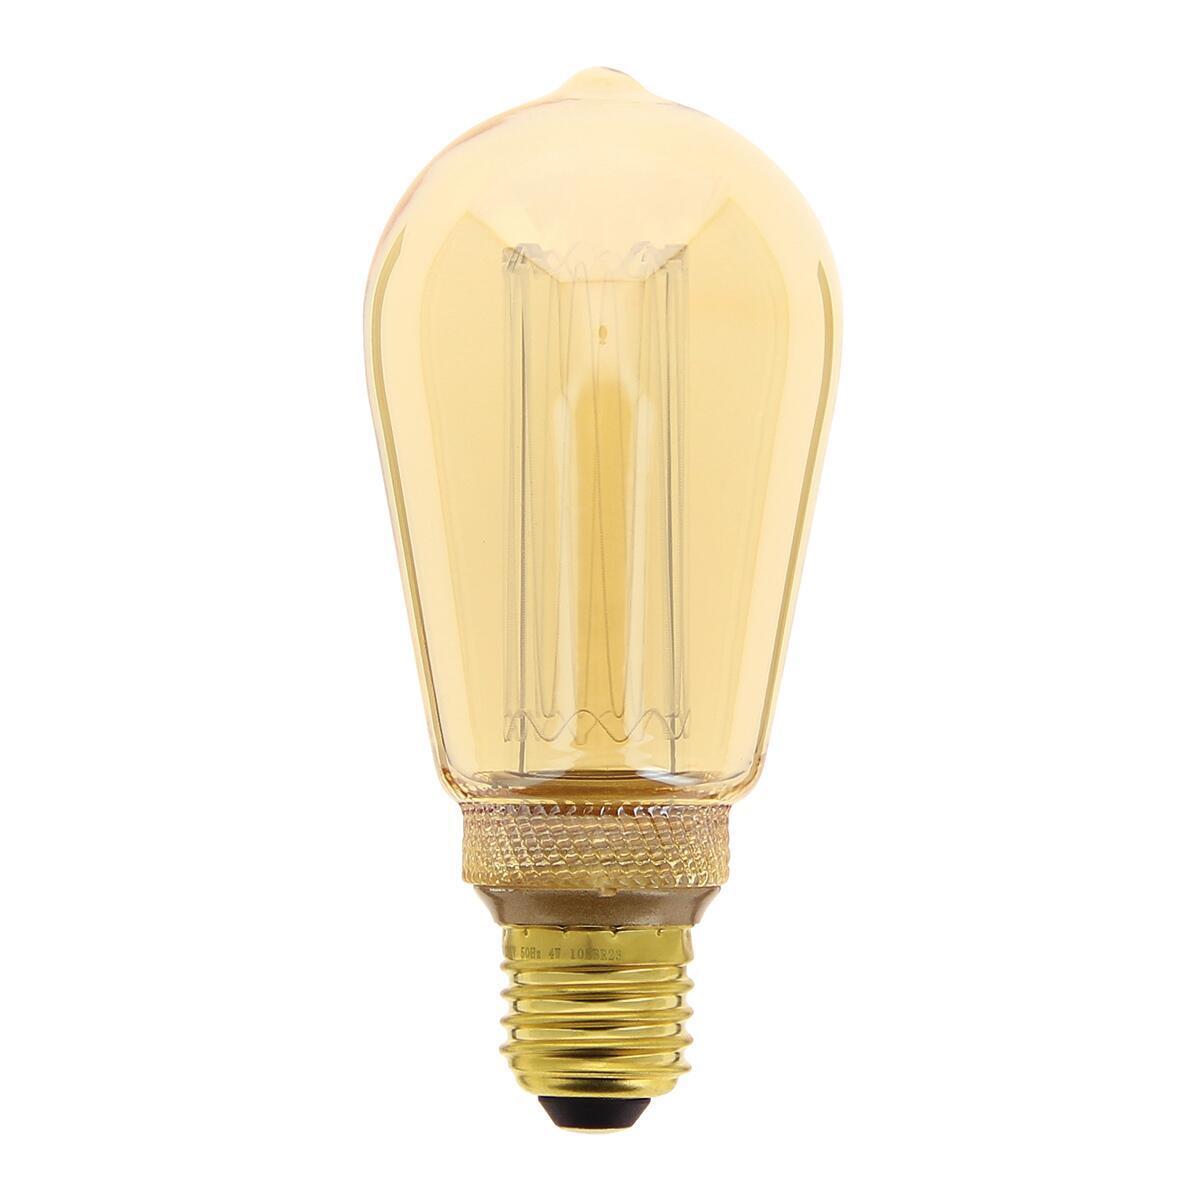 Lampadina decorativa LED, E27, Goccia, Ambra, Luce calda, 40W=200LM (equiv 40 W), 320° , XANLITE - 1